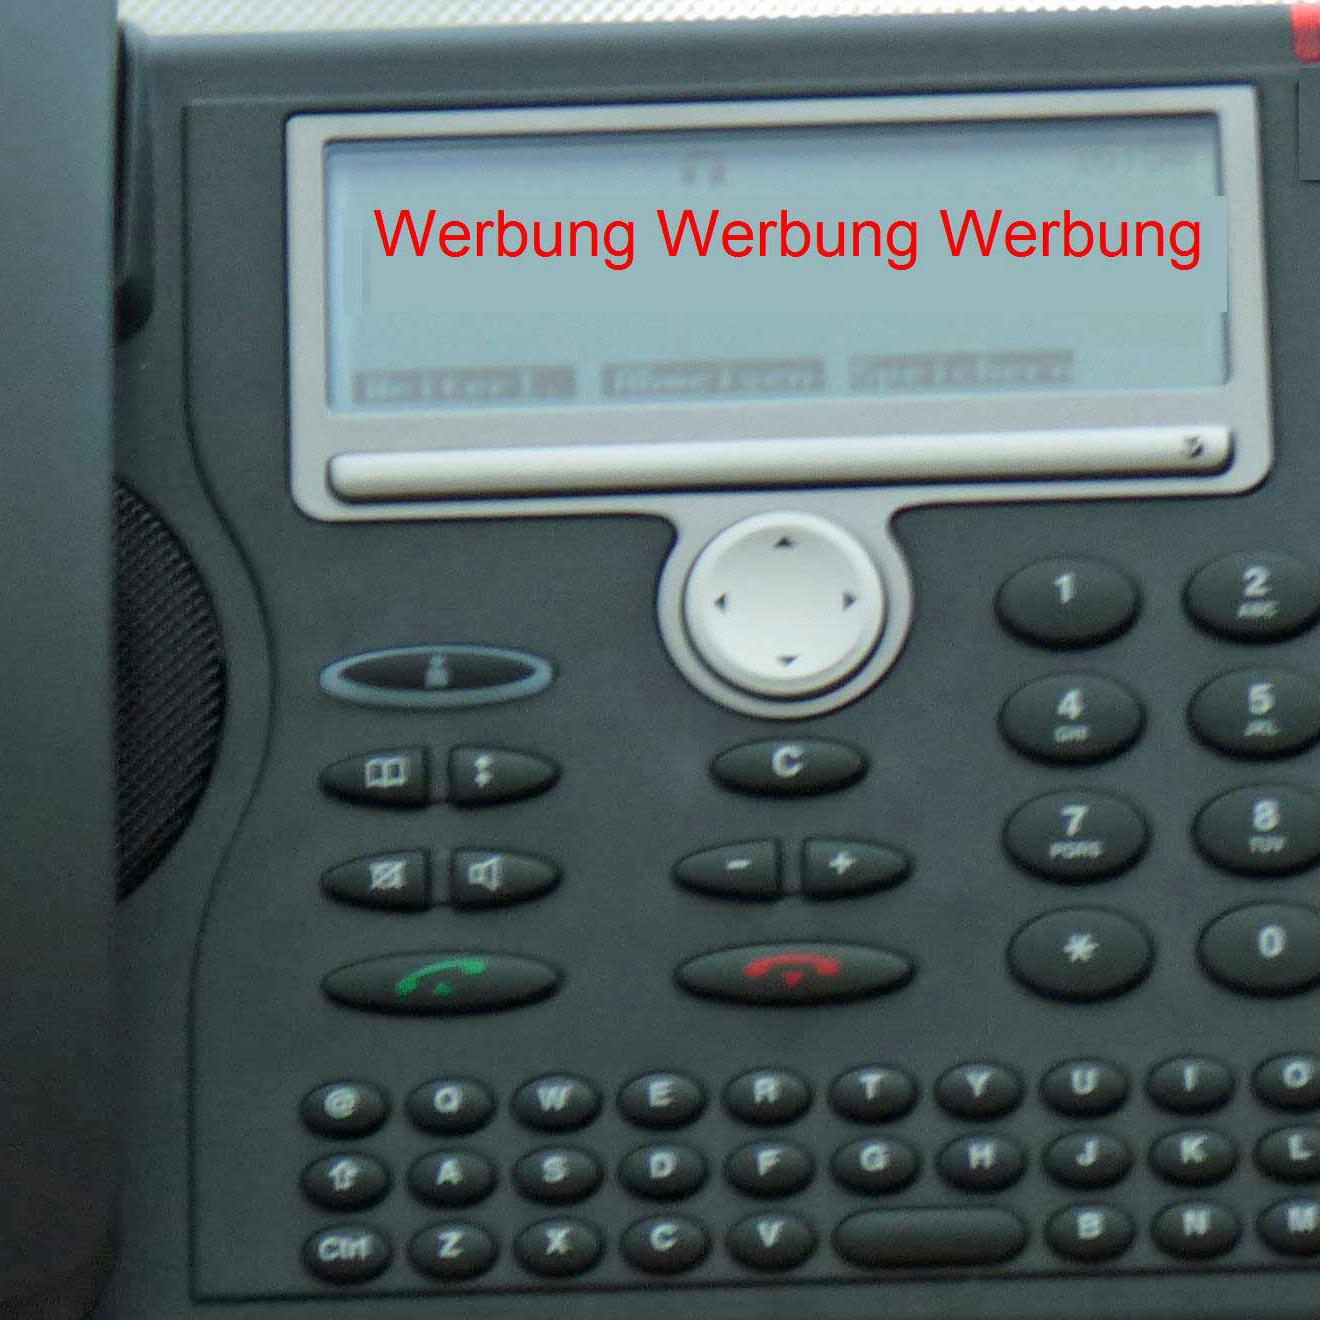 Telefonwerbung verboten (C) 2014 Be